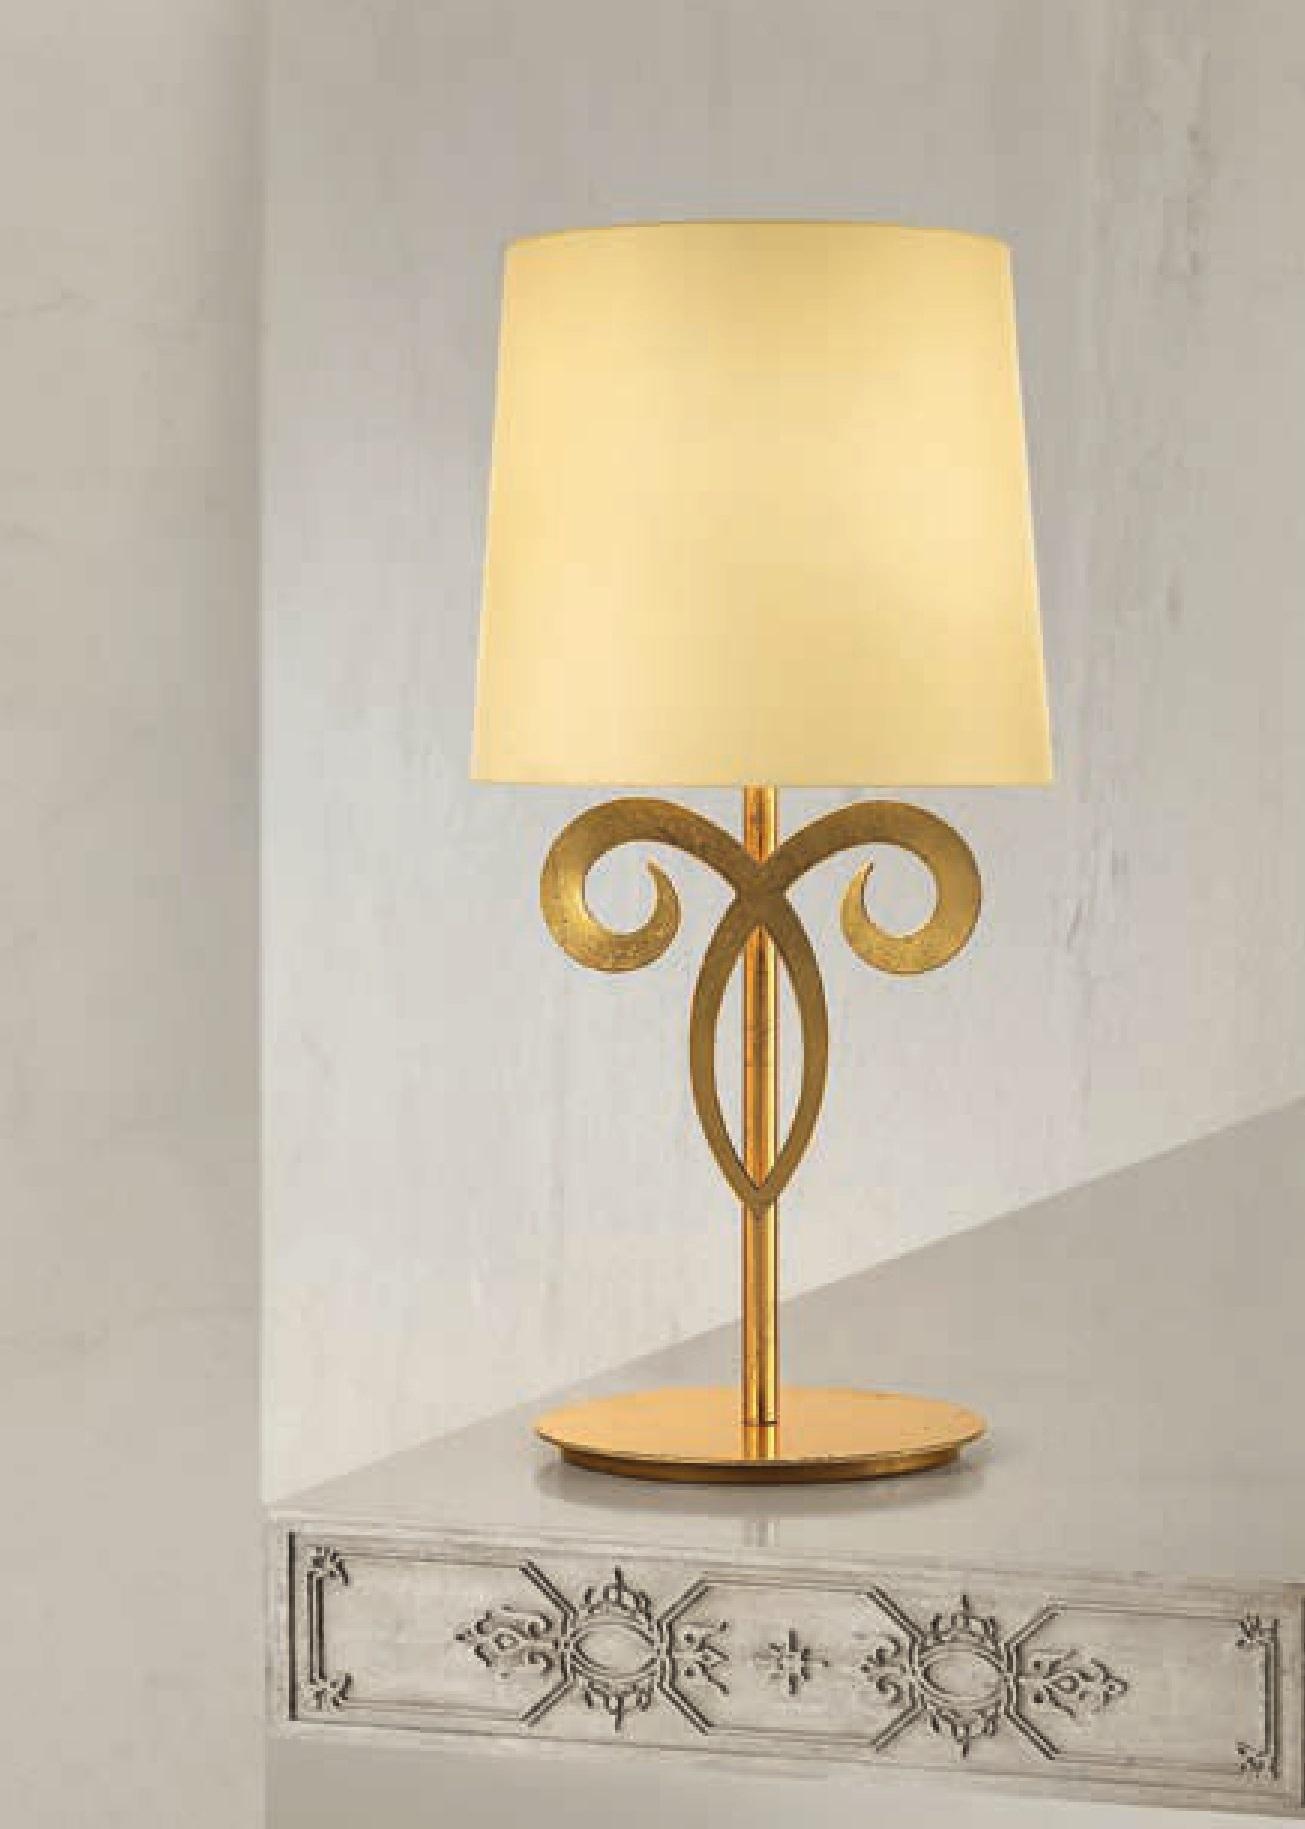 LAMPADA ABAT JOUR DA COMODINO CLASSICA LAM EXPORT FOGLIA ORO VETRO AMBRA